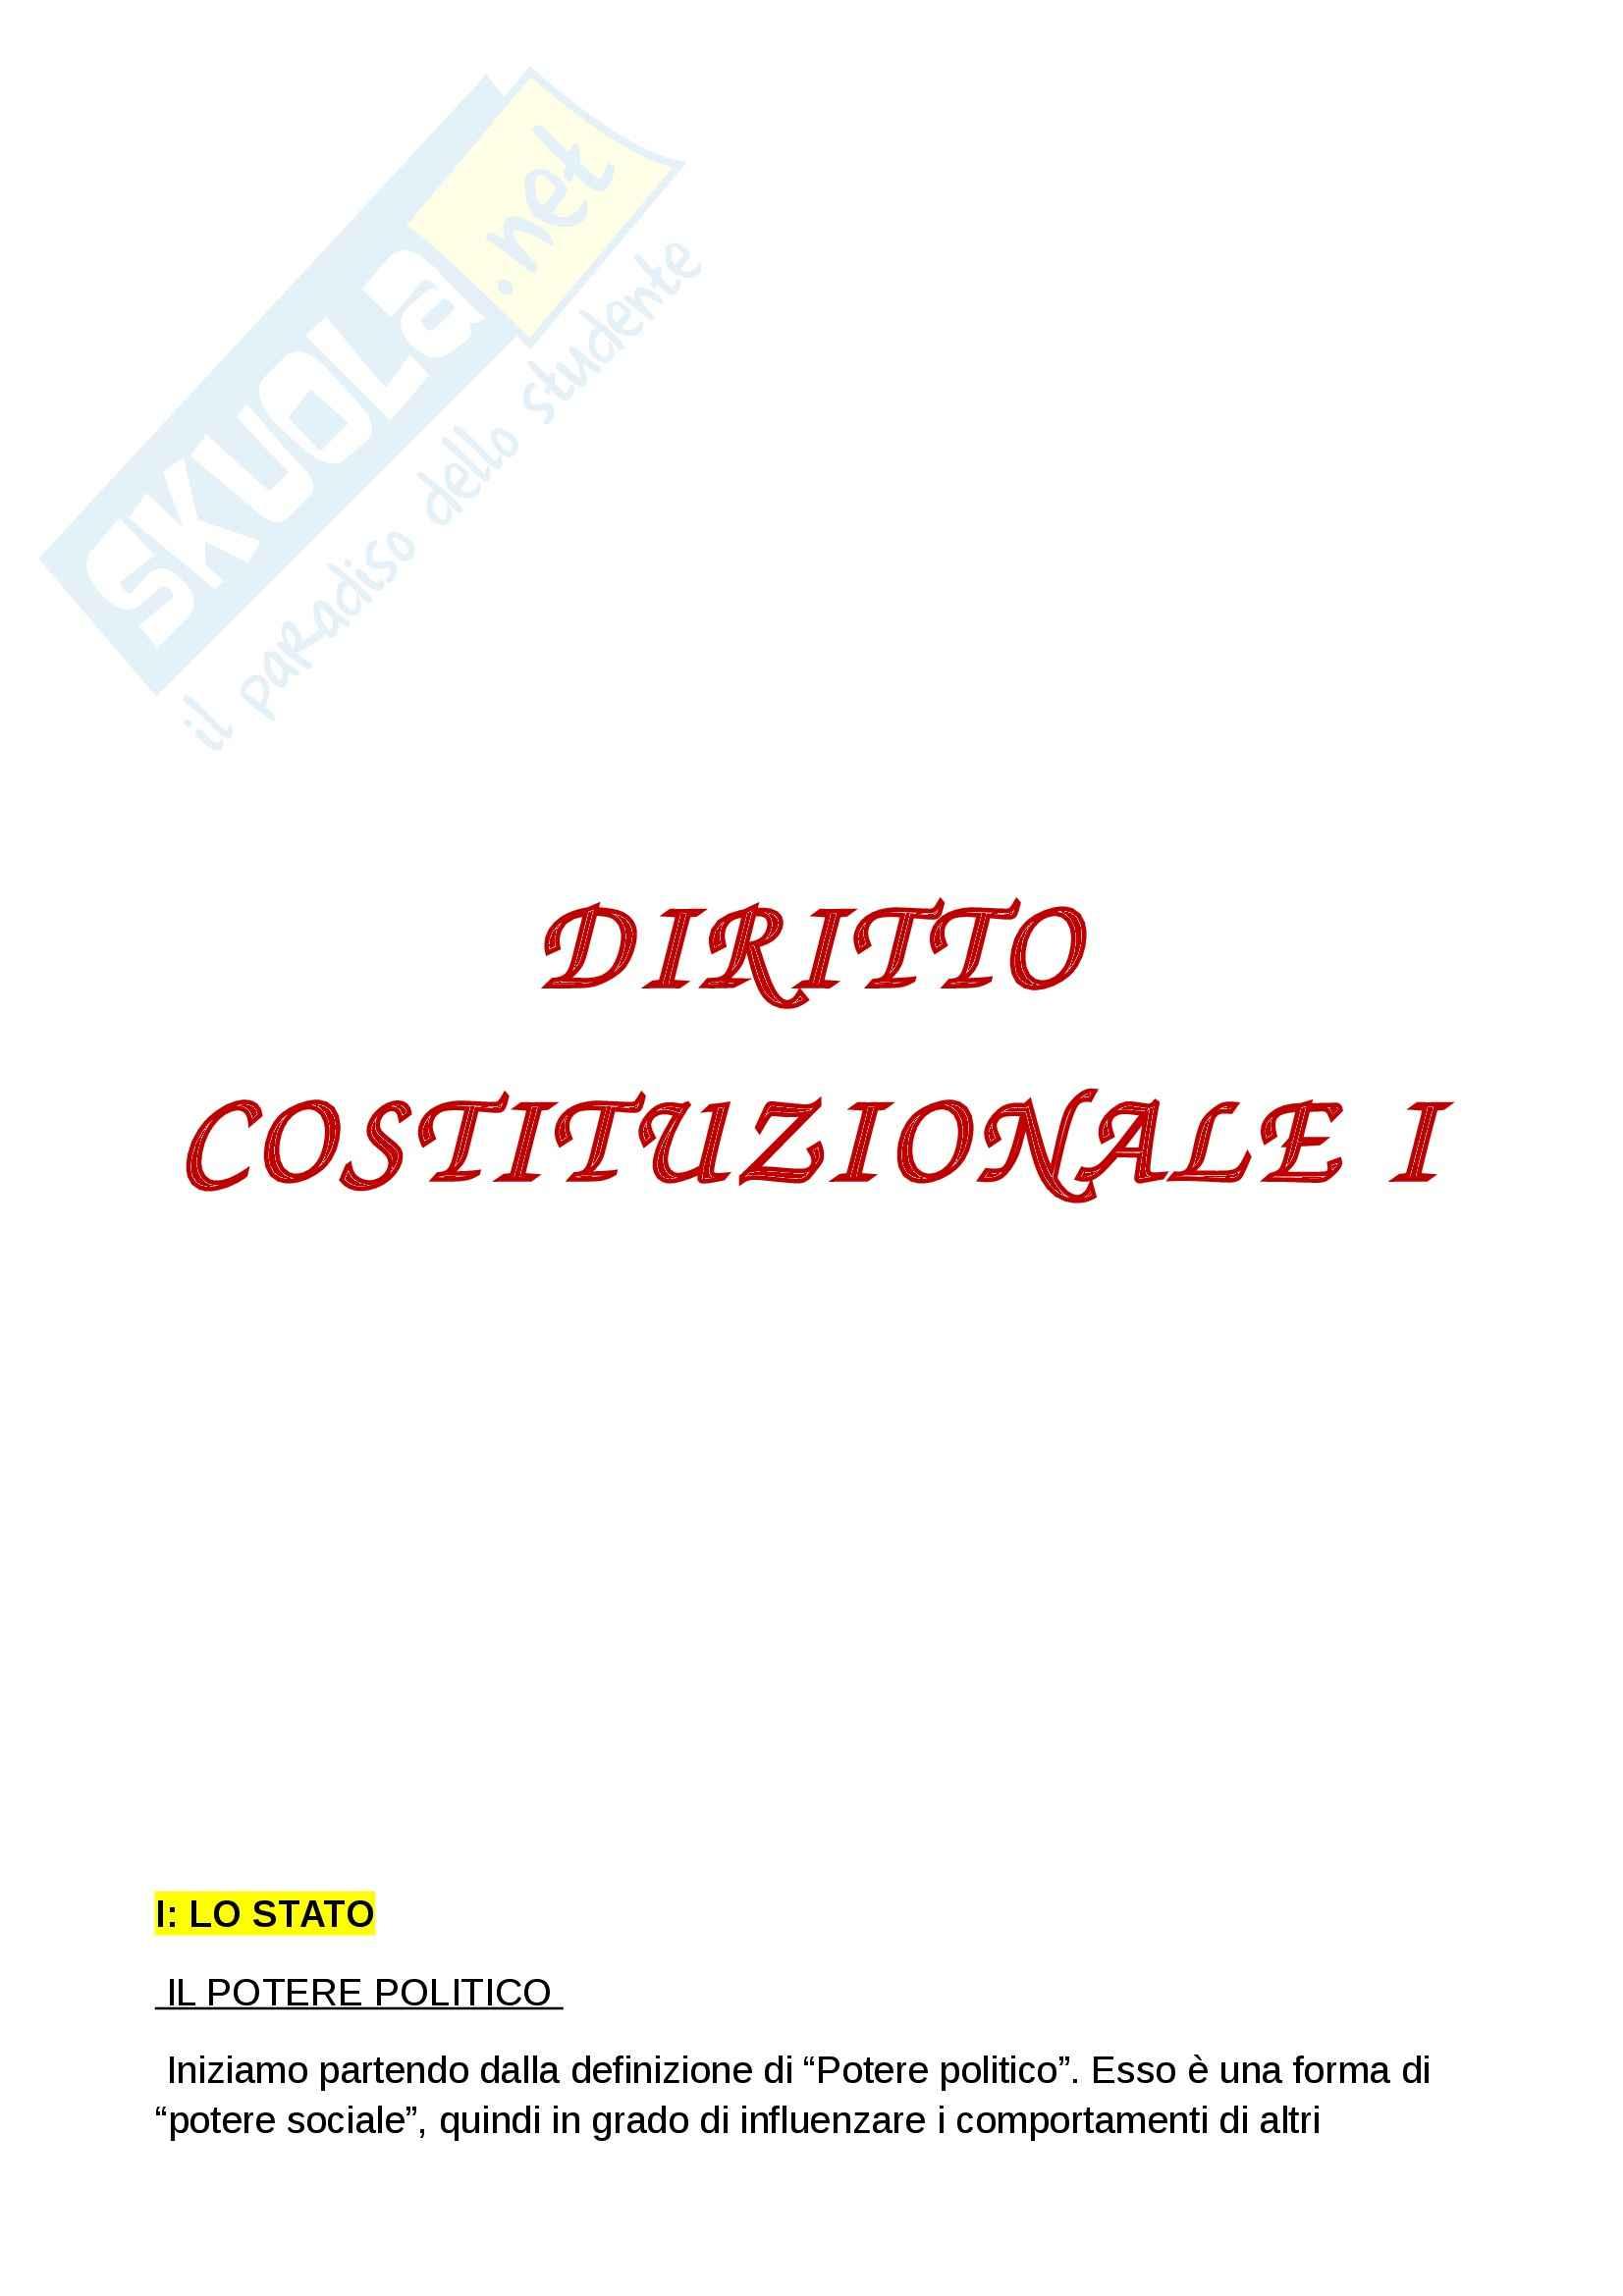 Riassunto esame diritto costituzionale, prof. Grosso, libro Diritto costituzionale, Bin, Pitruzzella